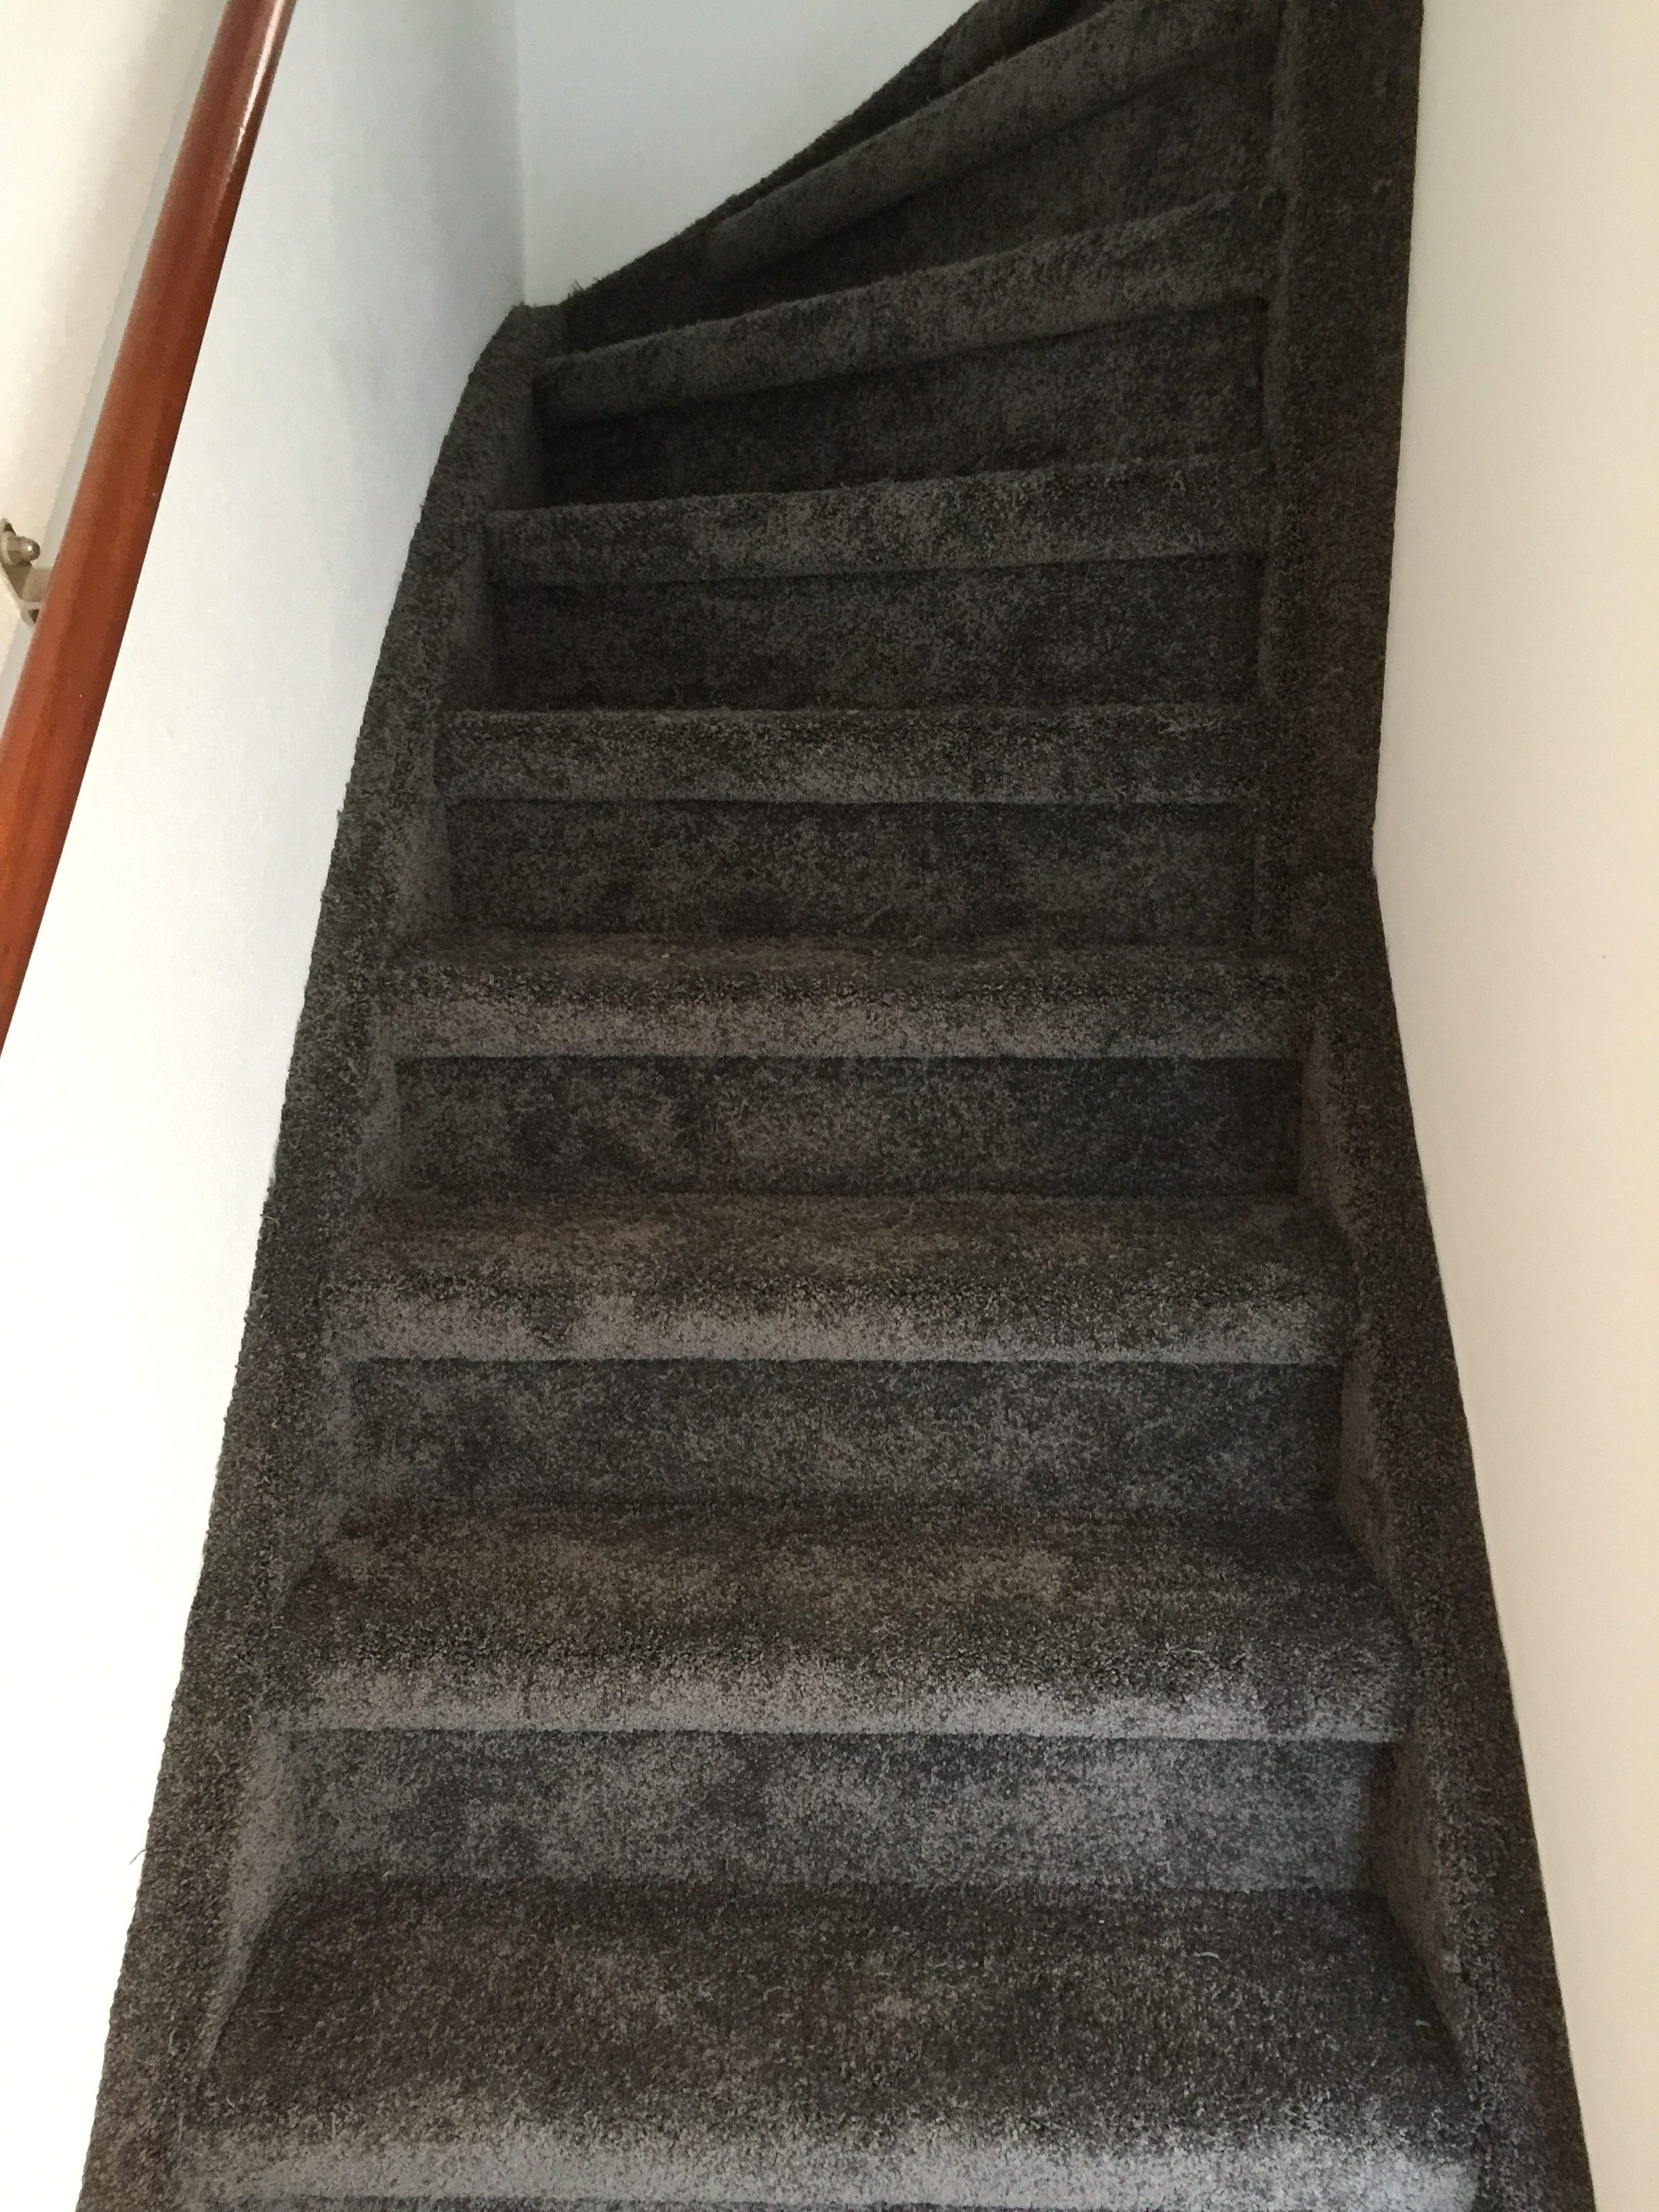 Hedendaags Voordelig Trappen Bekleden in Den Haag – Vakkundig trap bekleden TB-87